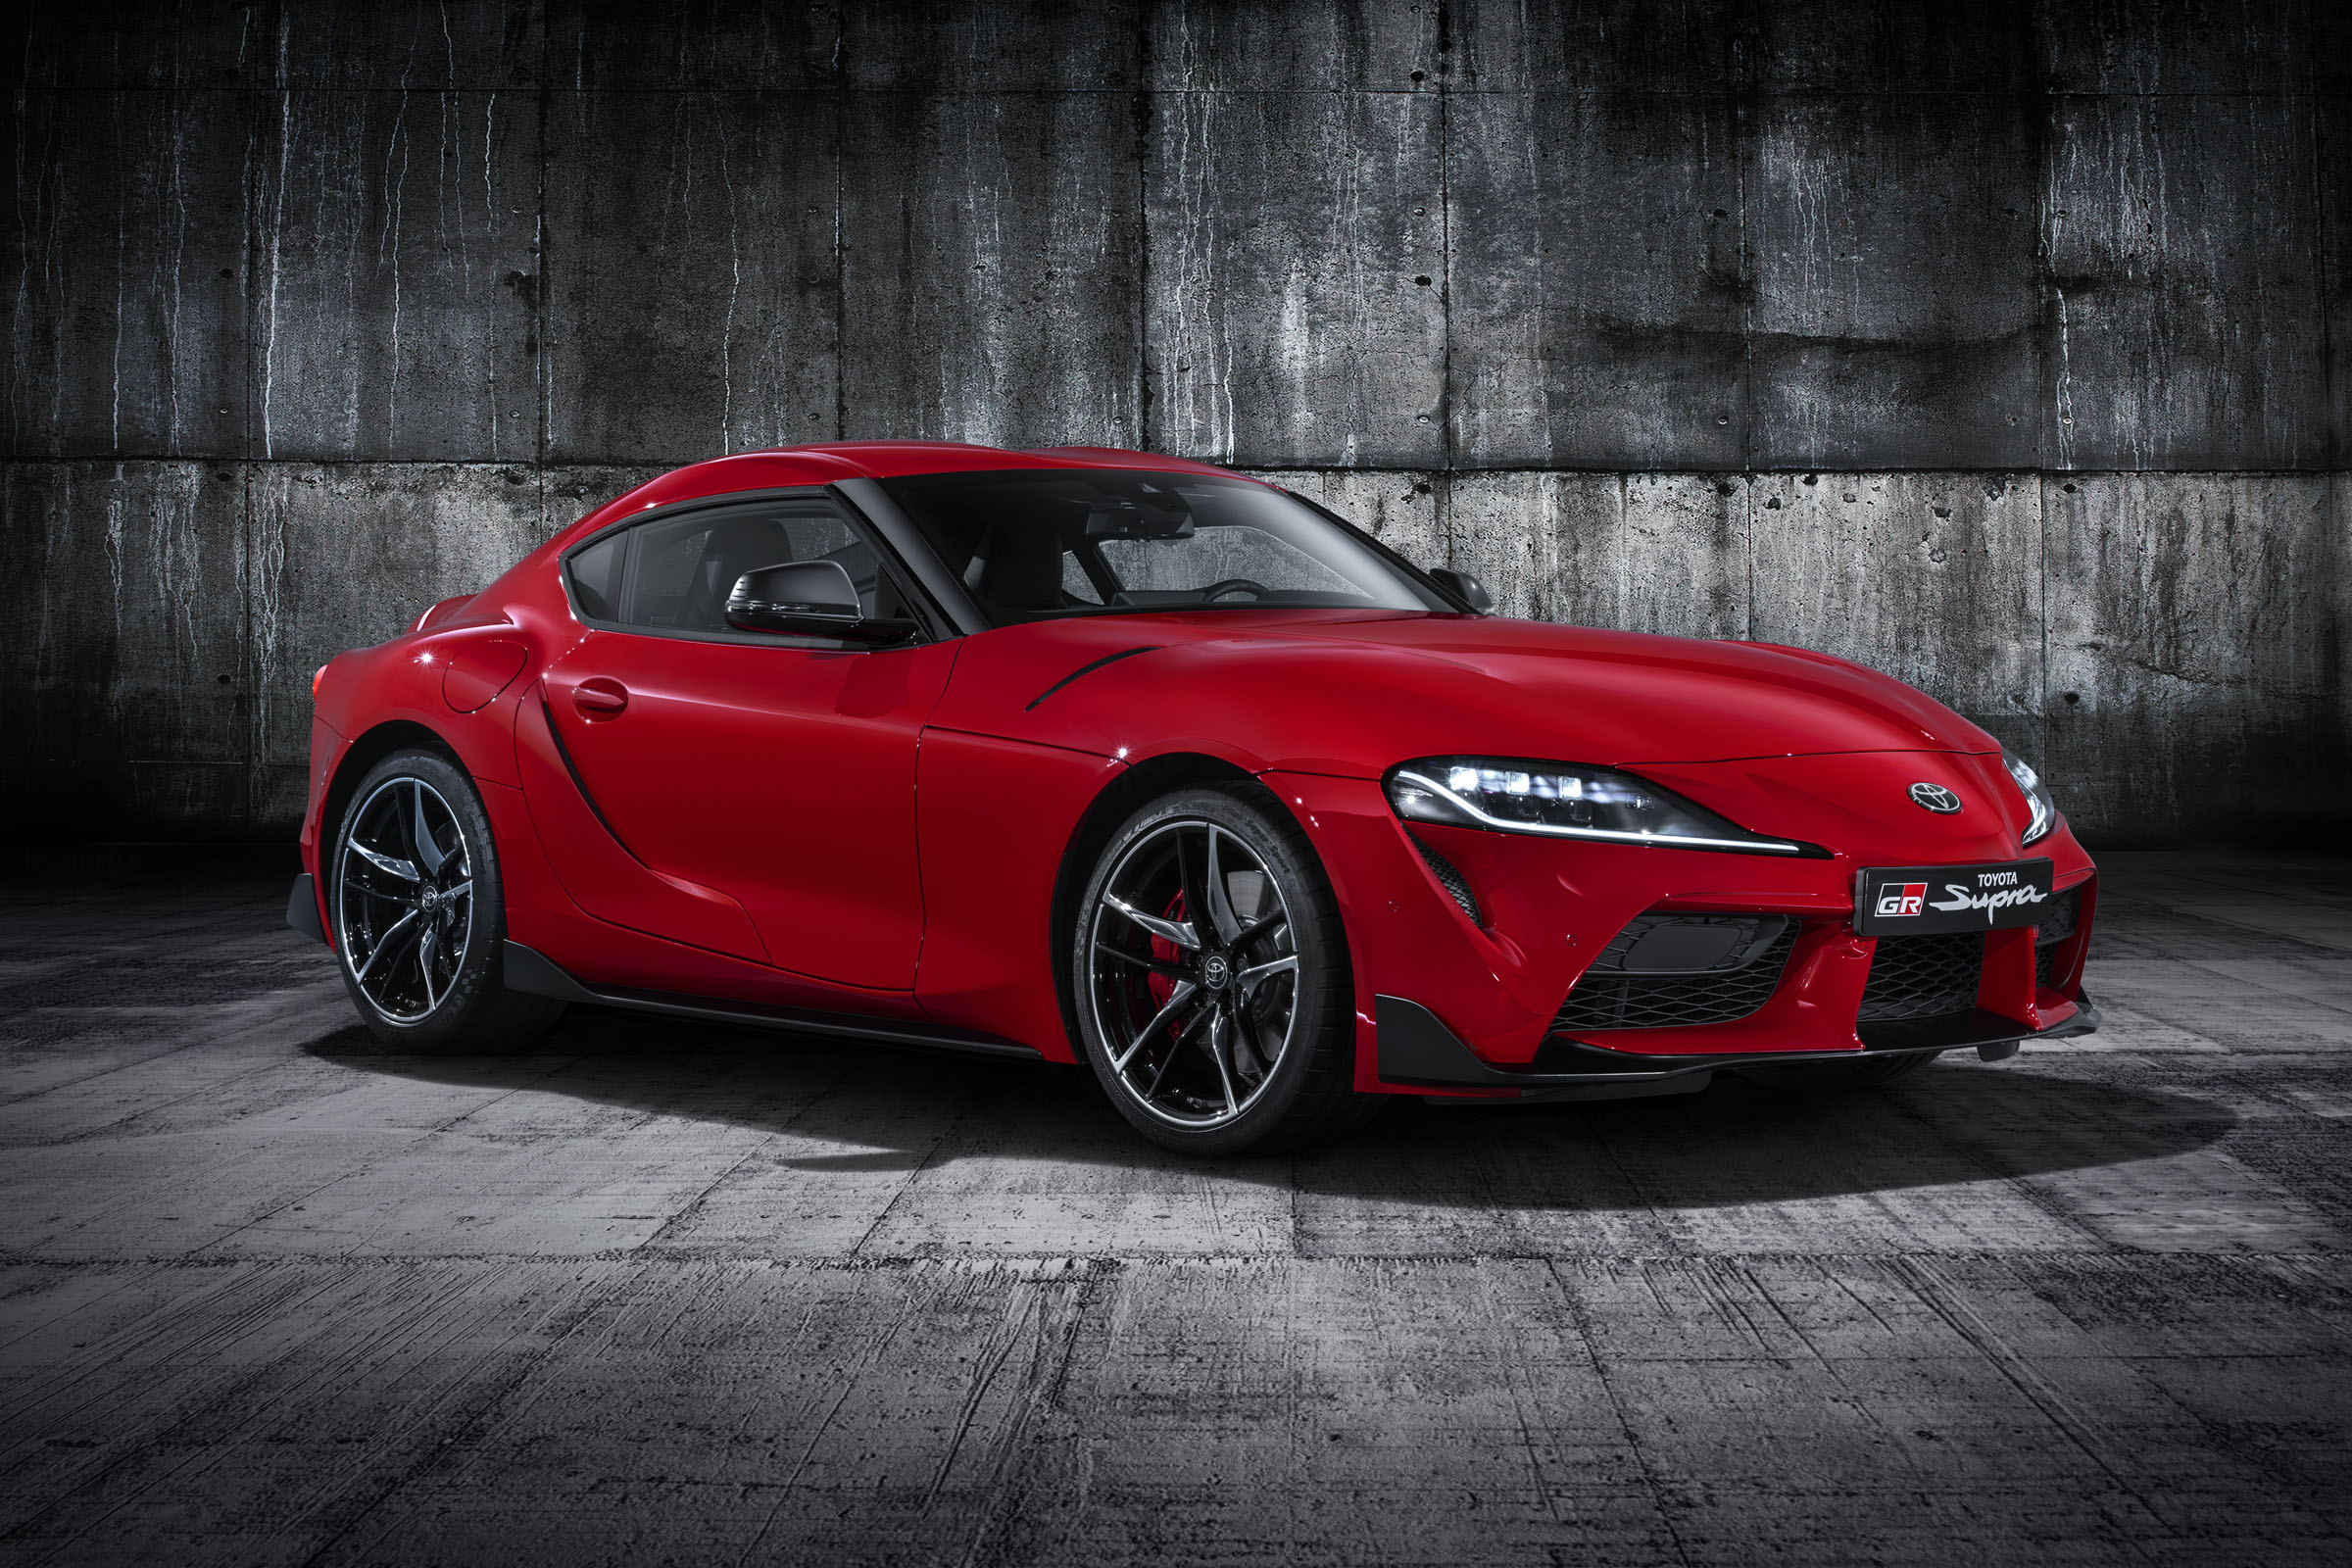 Kelebihan Kekurangan Supra Toyota 2019 Tangguh